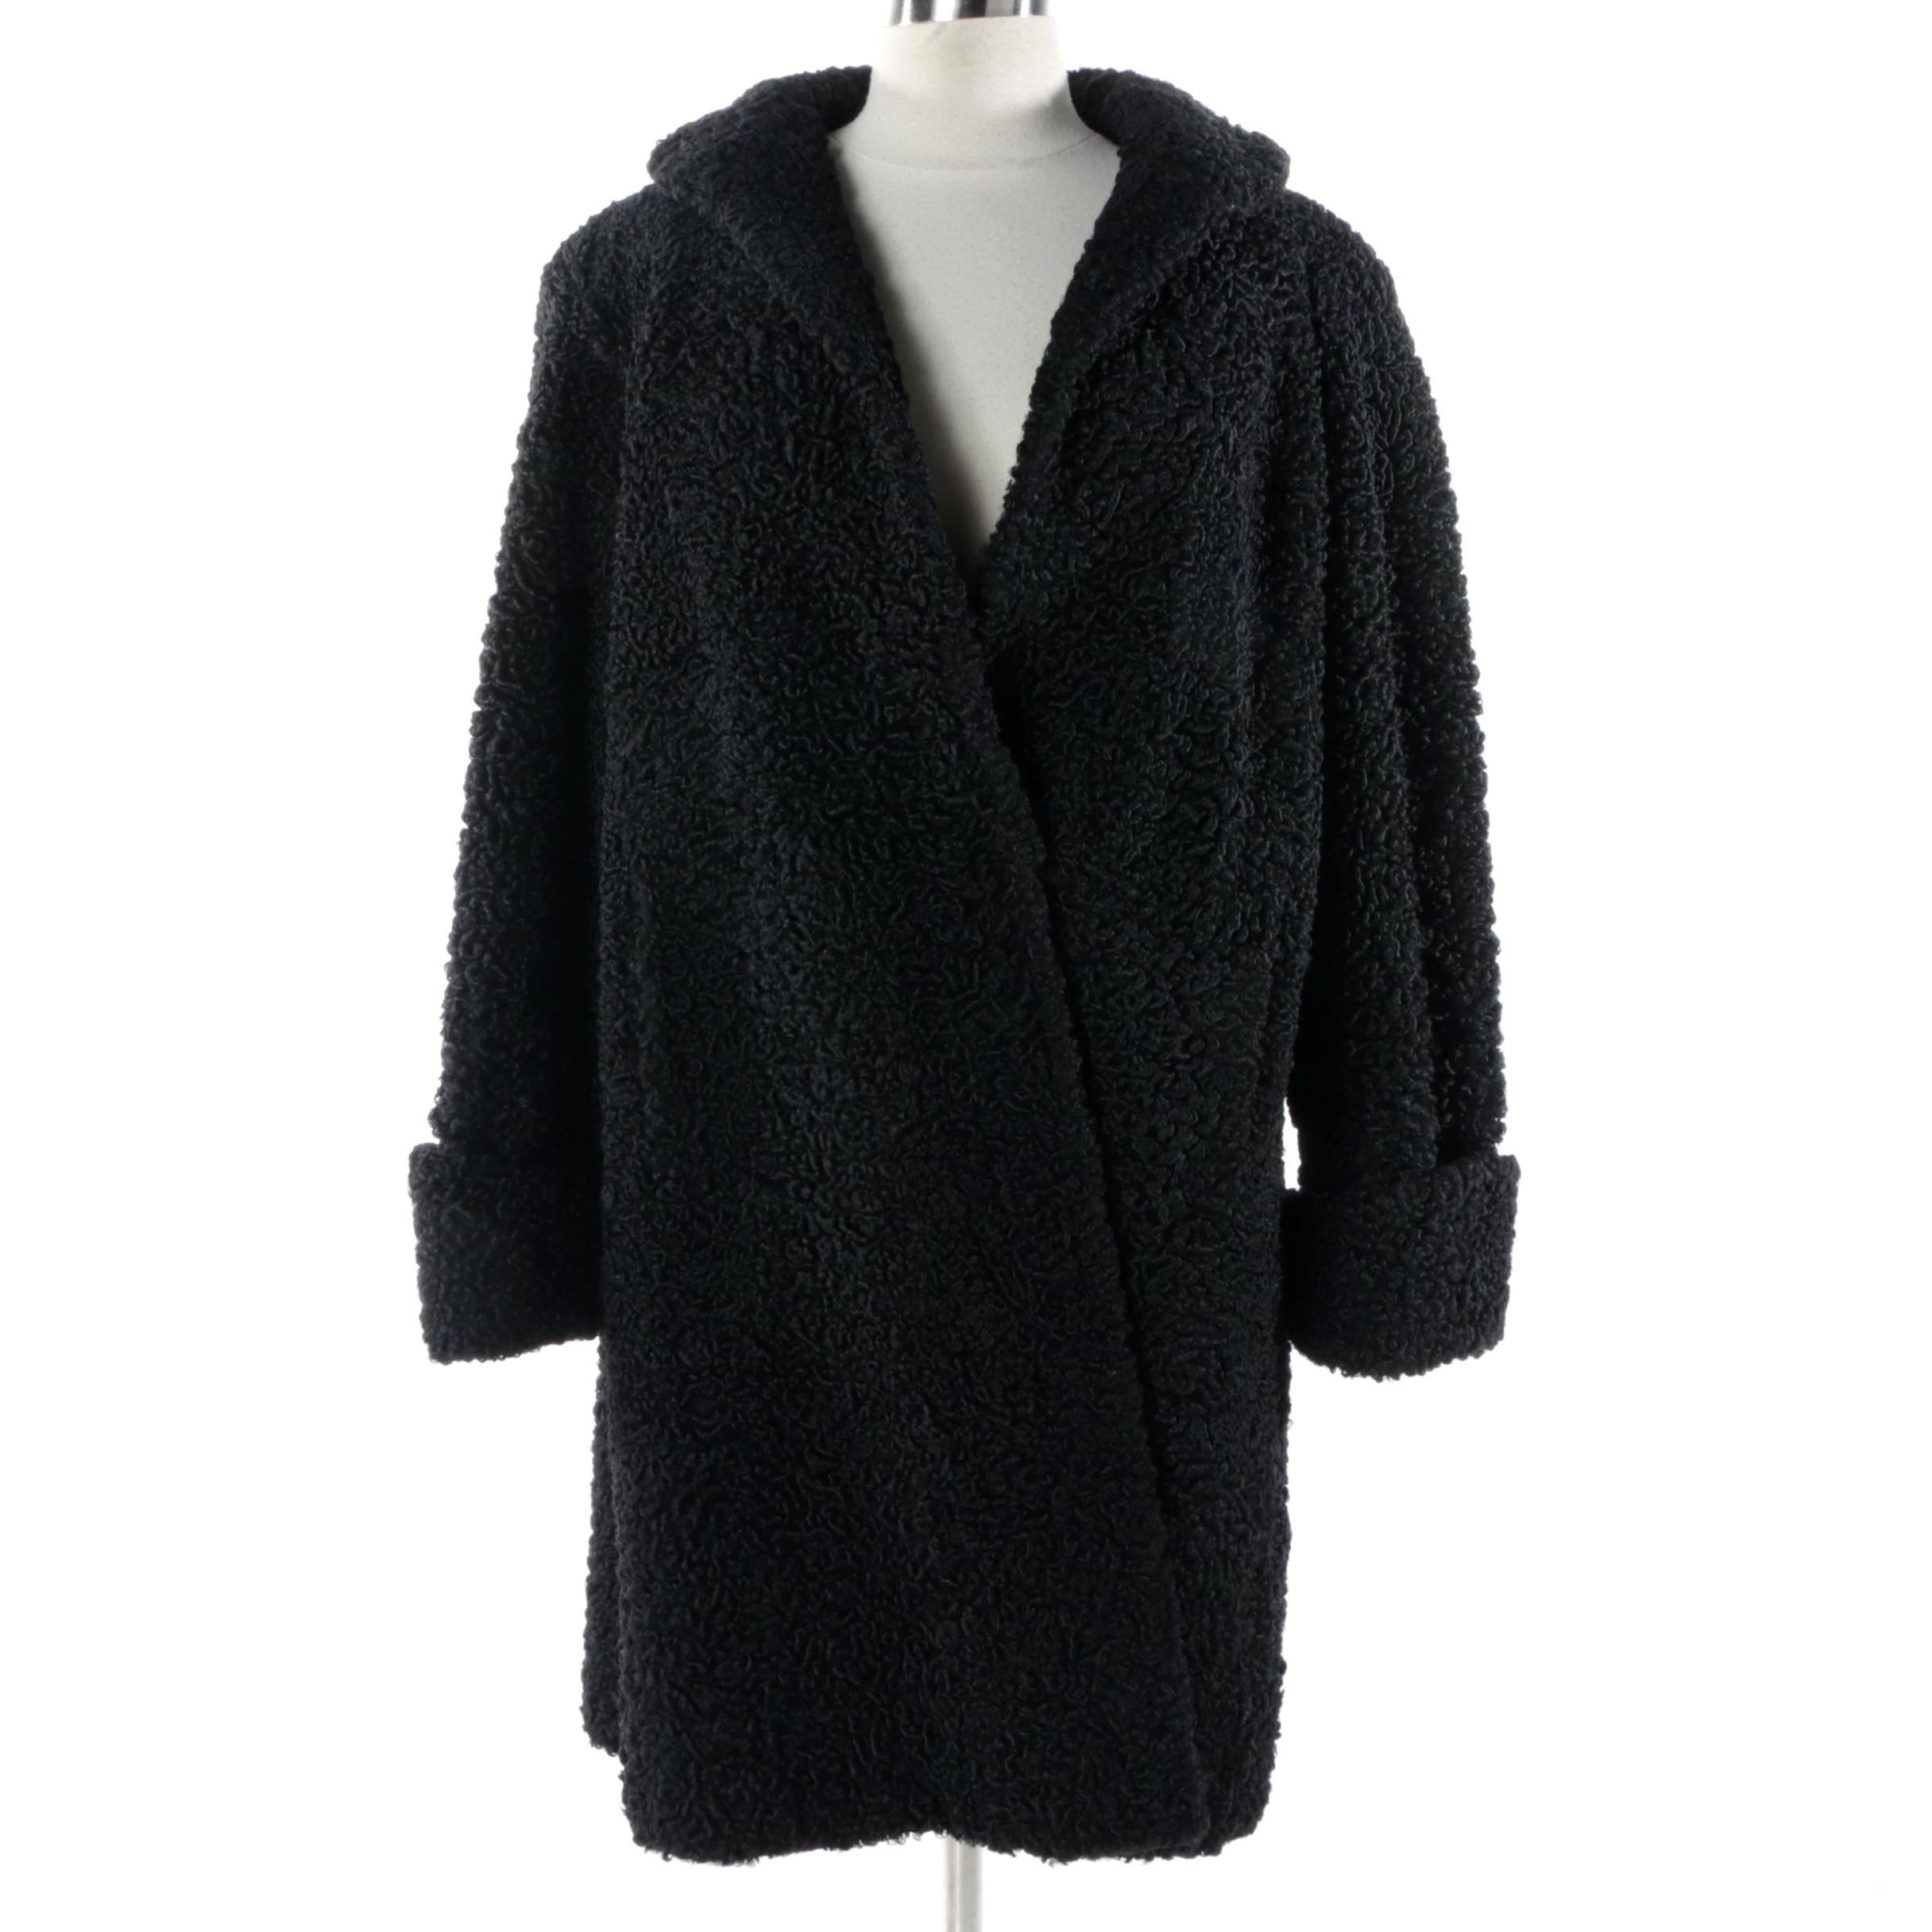 Women's Vintage Black Persian Lamb Coat